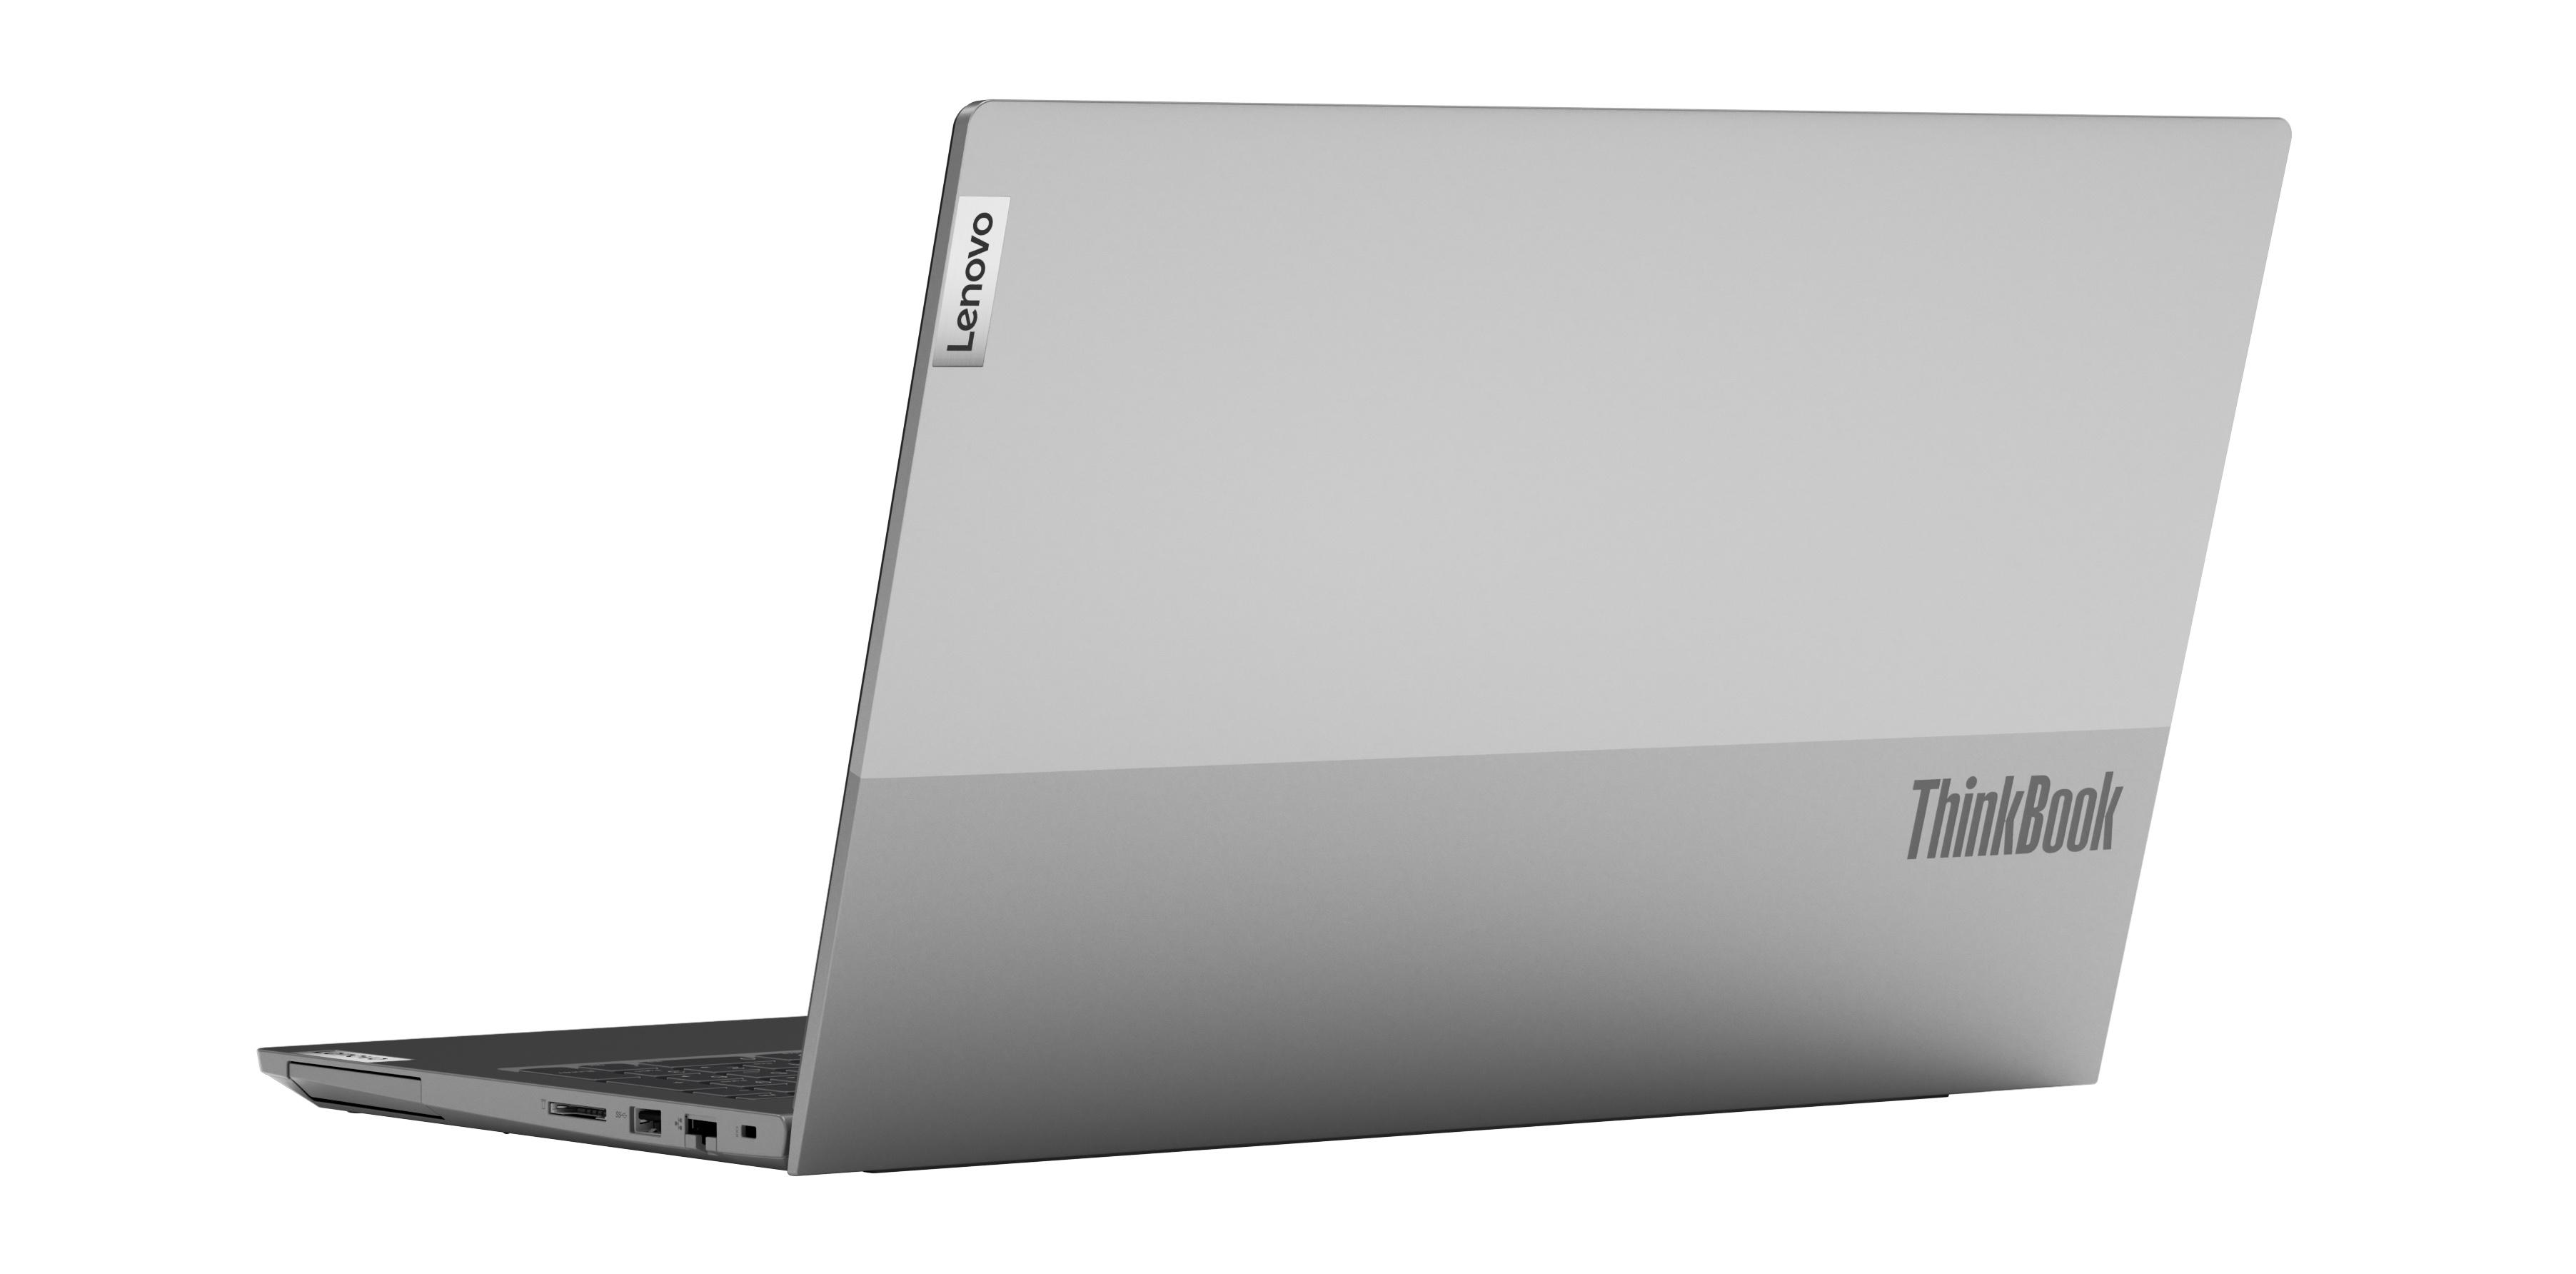 Фото  Ноутбук ThinkBook 15 G2 ARE Mineral Grey (20VG00B0RU)